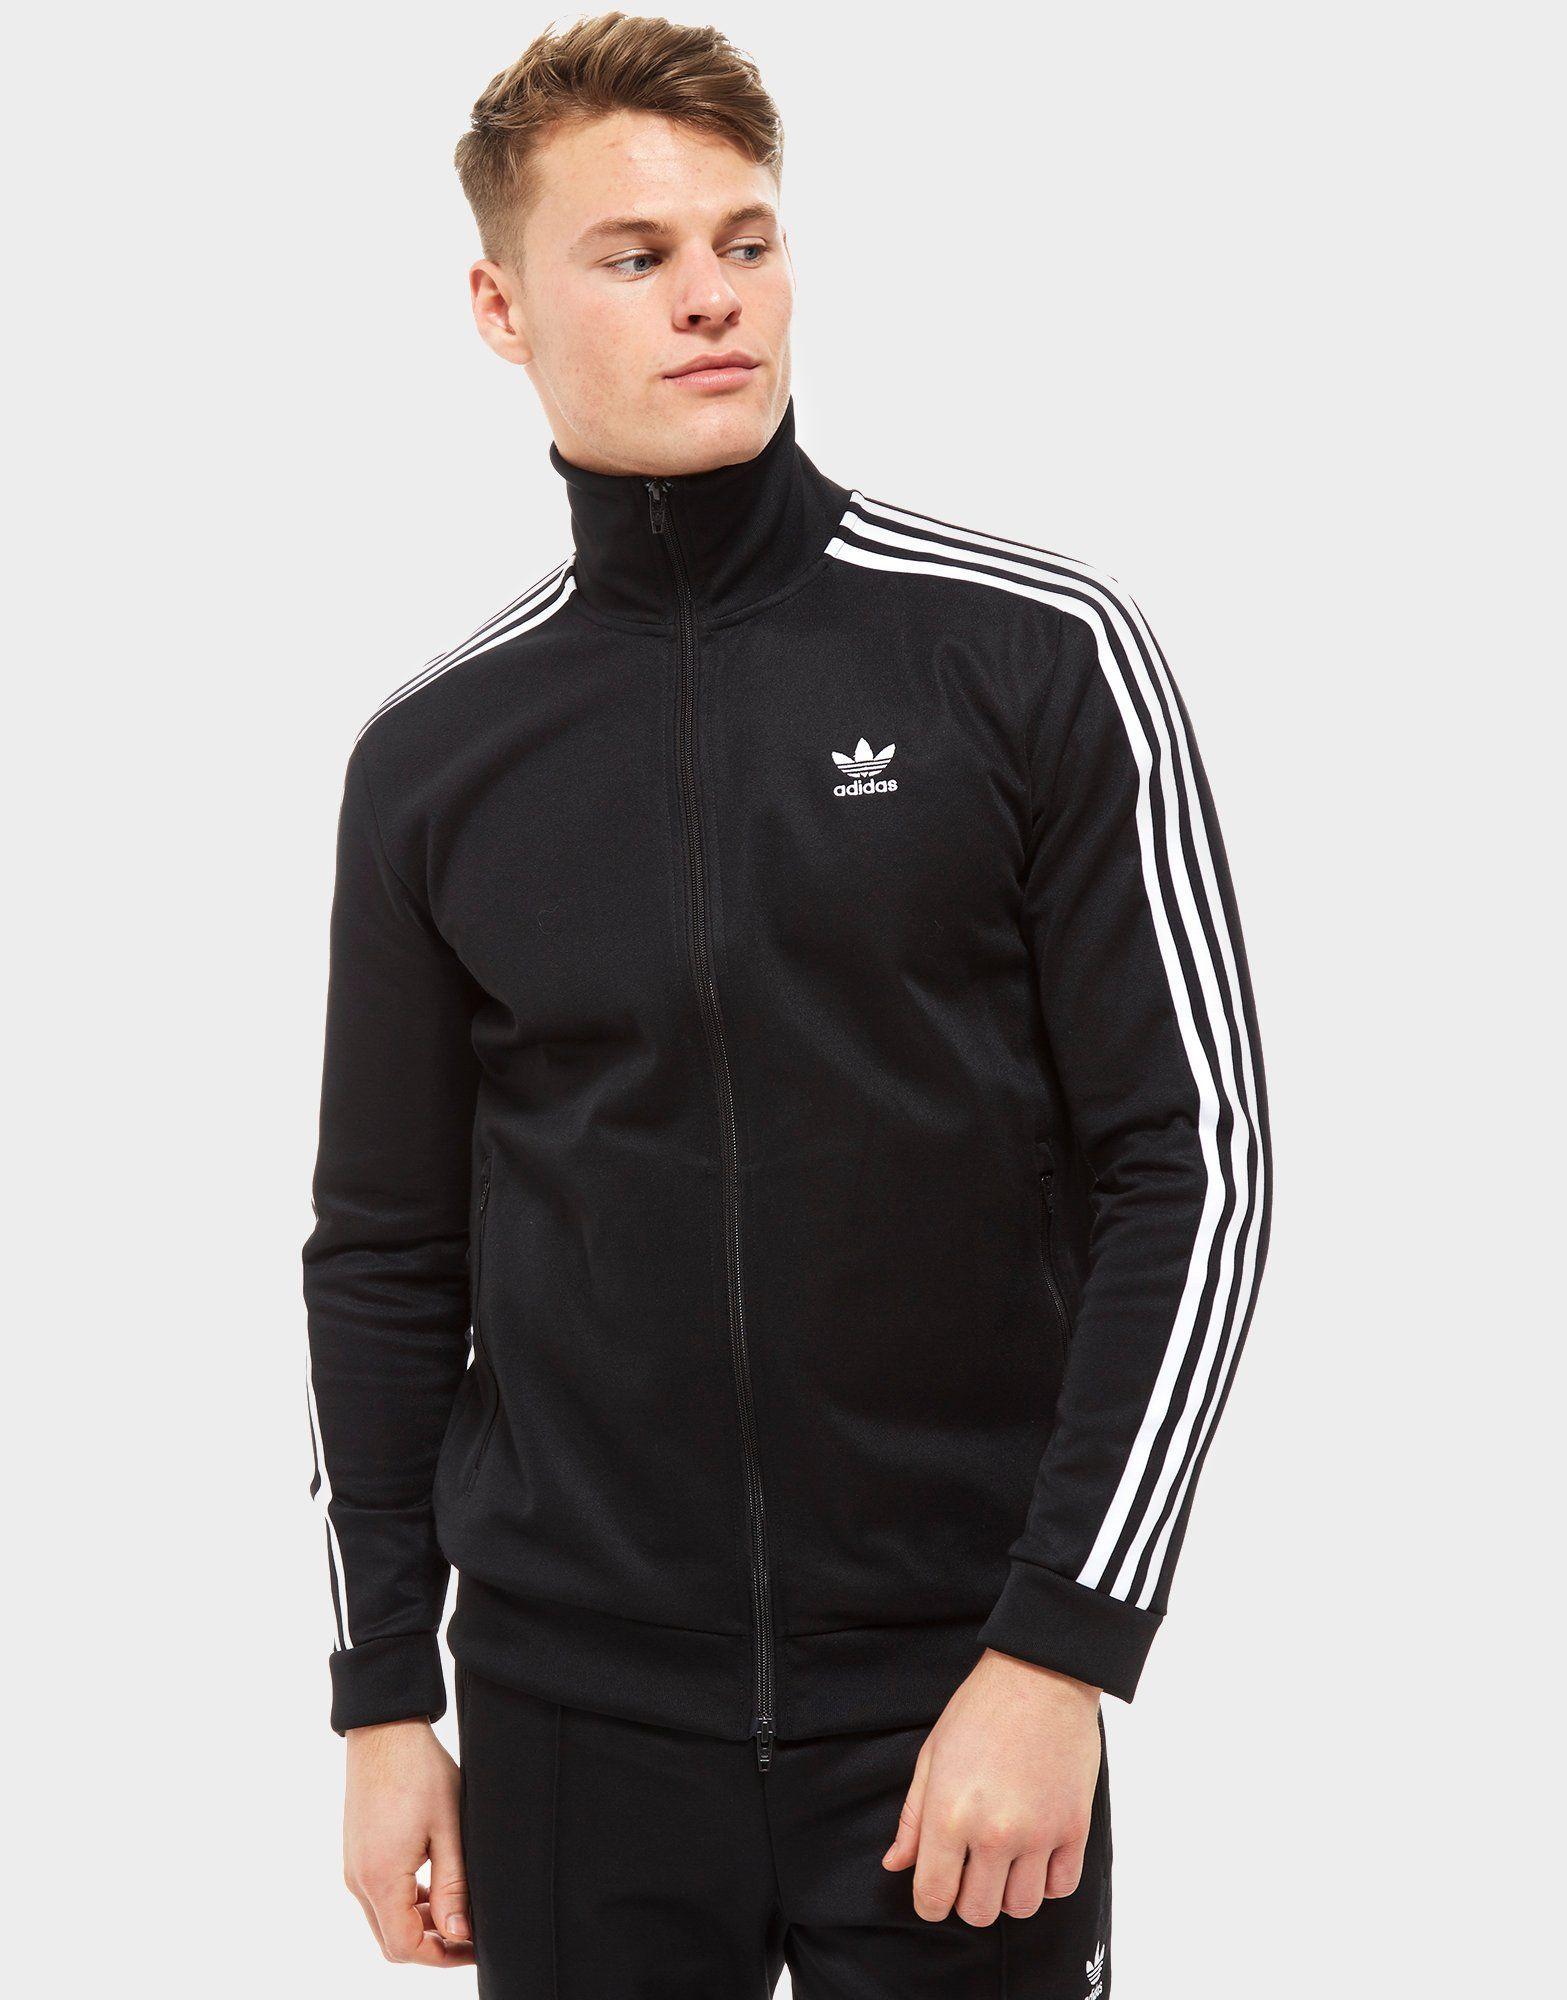 adidas Originals Beckenbauer Full Zip